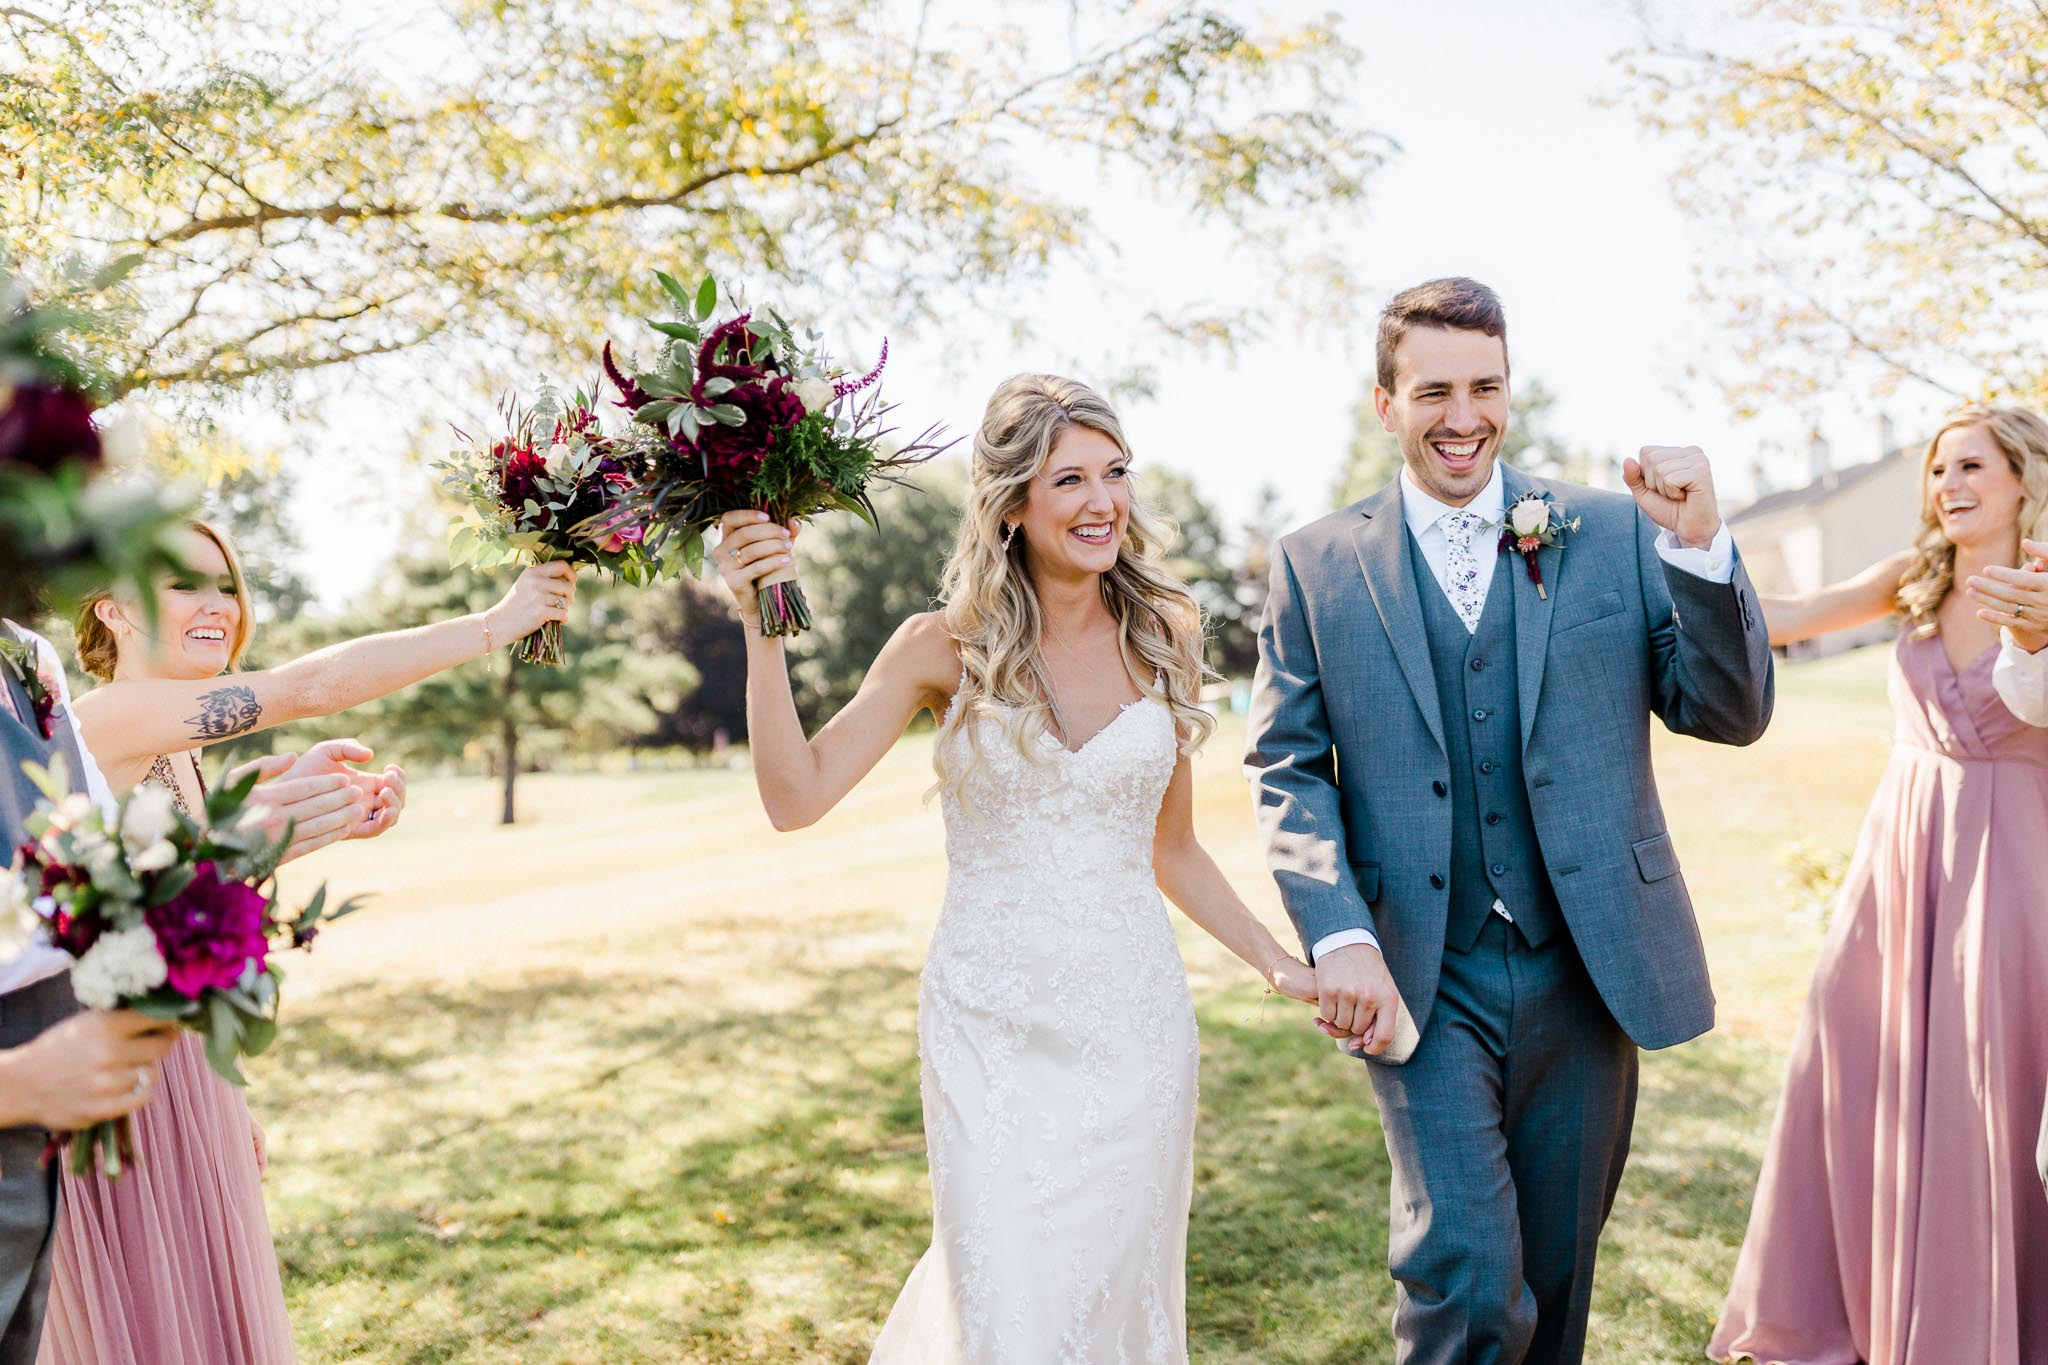 Frosty-Valley-September-Wedding-7483.jpg